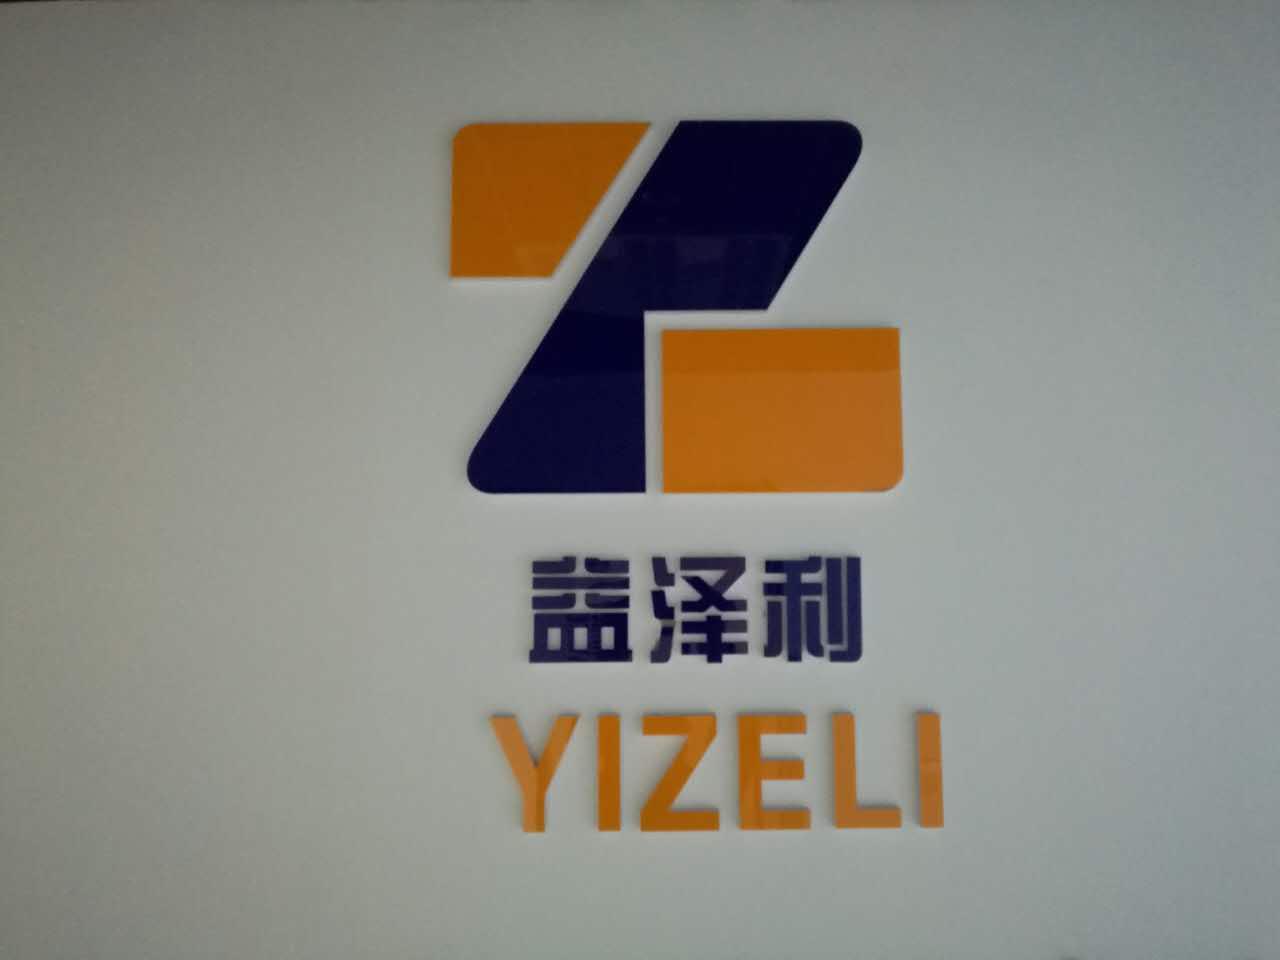 ZHENGZHOU YIZELI INDUSTRIAL CO., LTD